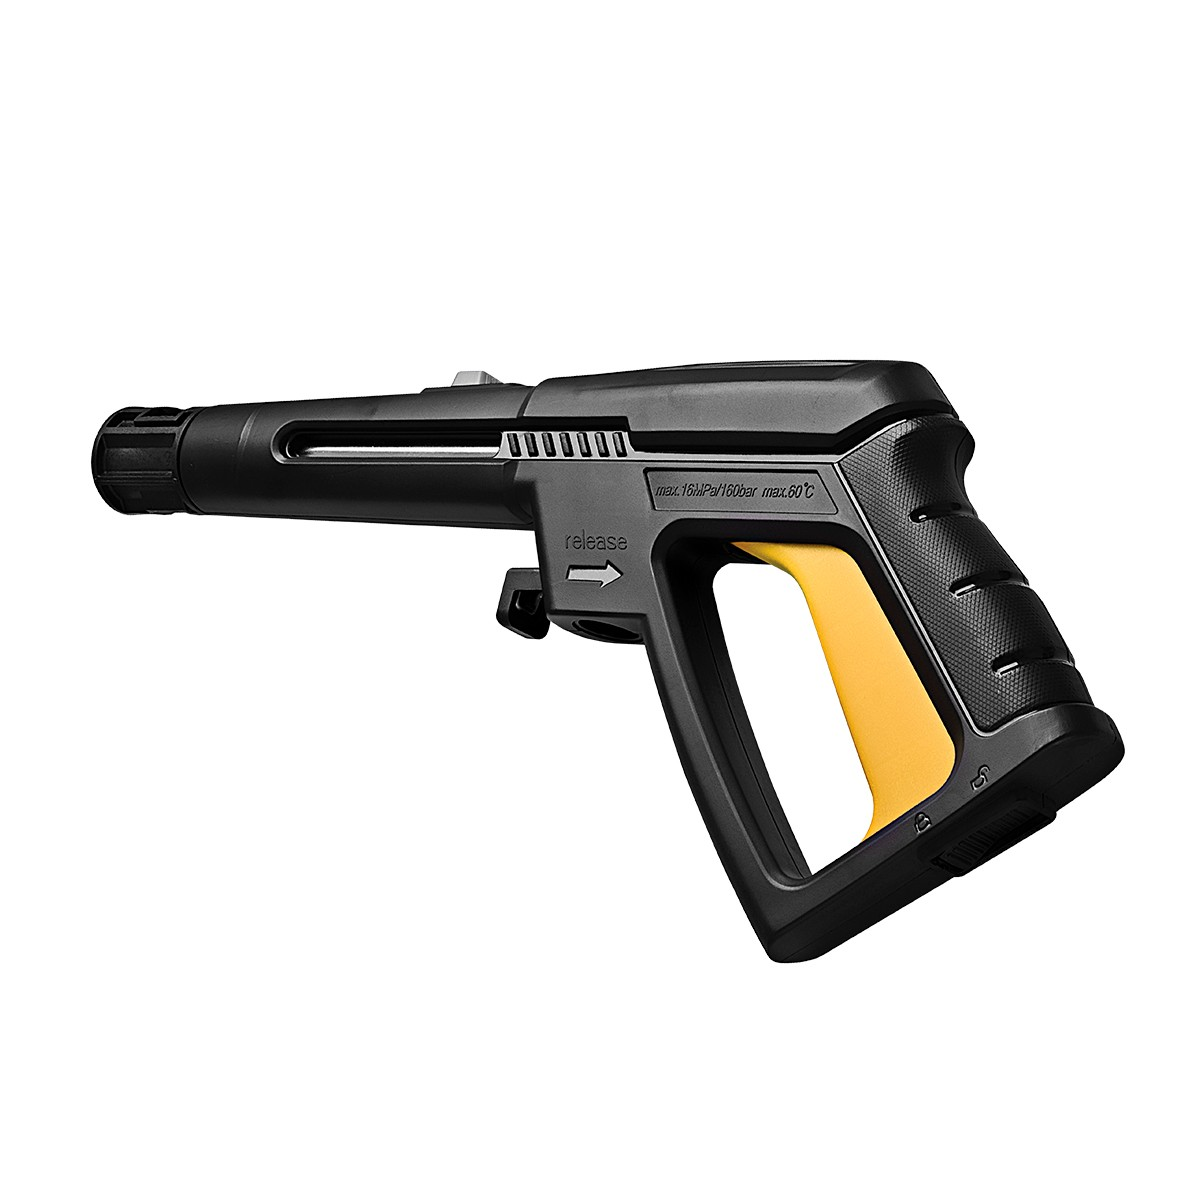 Pistola para Lavadora Tramontina 1900psi 1800w, 2100psi 2000w Original